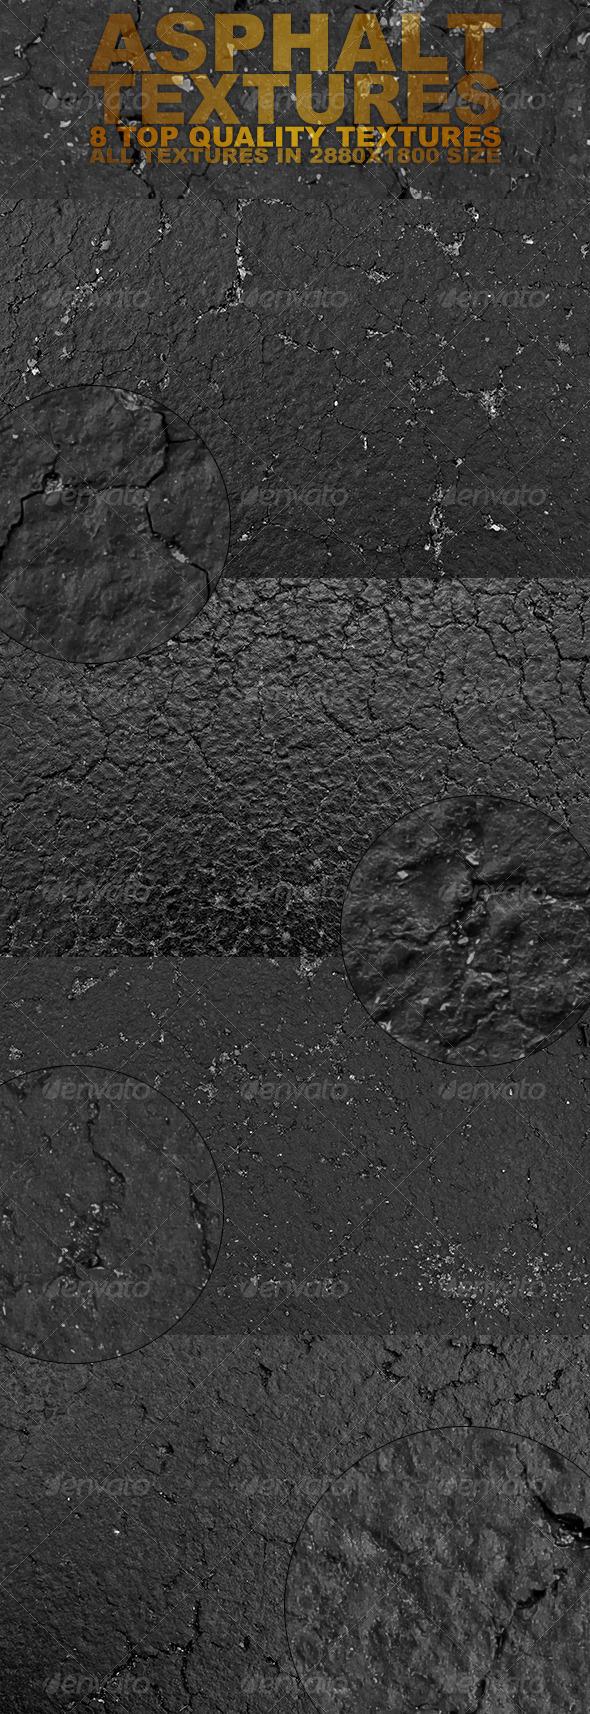 Black Asphalt Textures - Industrial / Grunge Textures